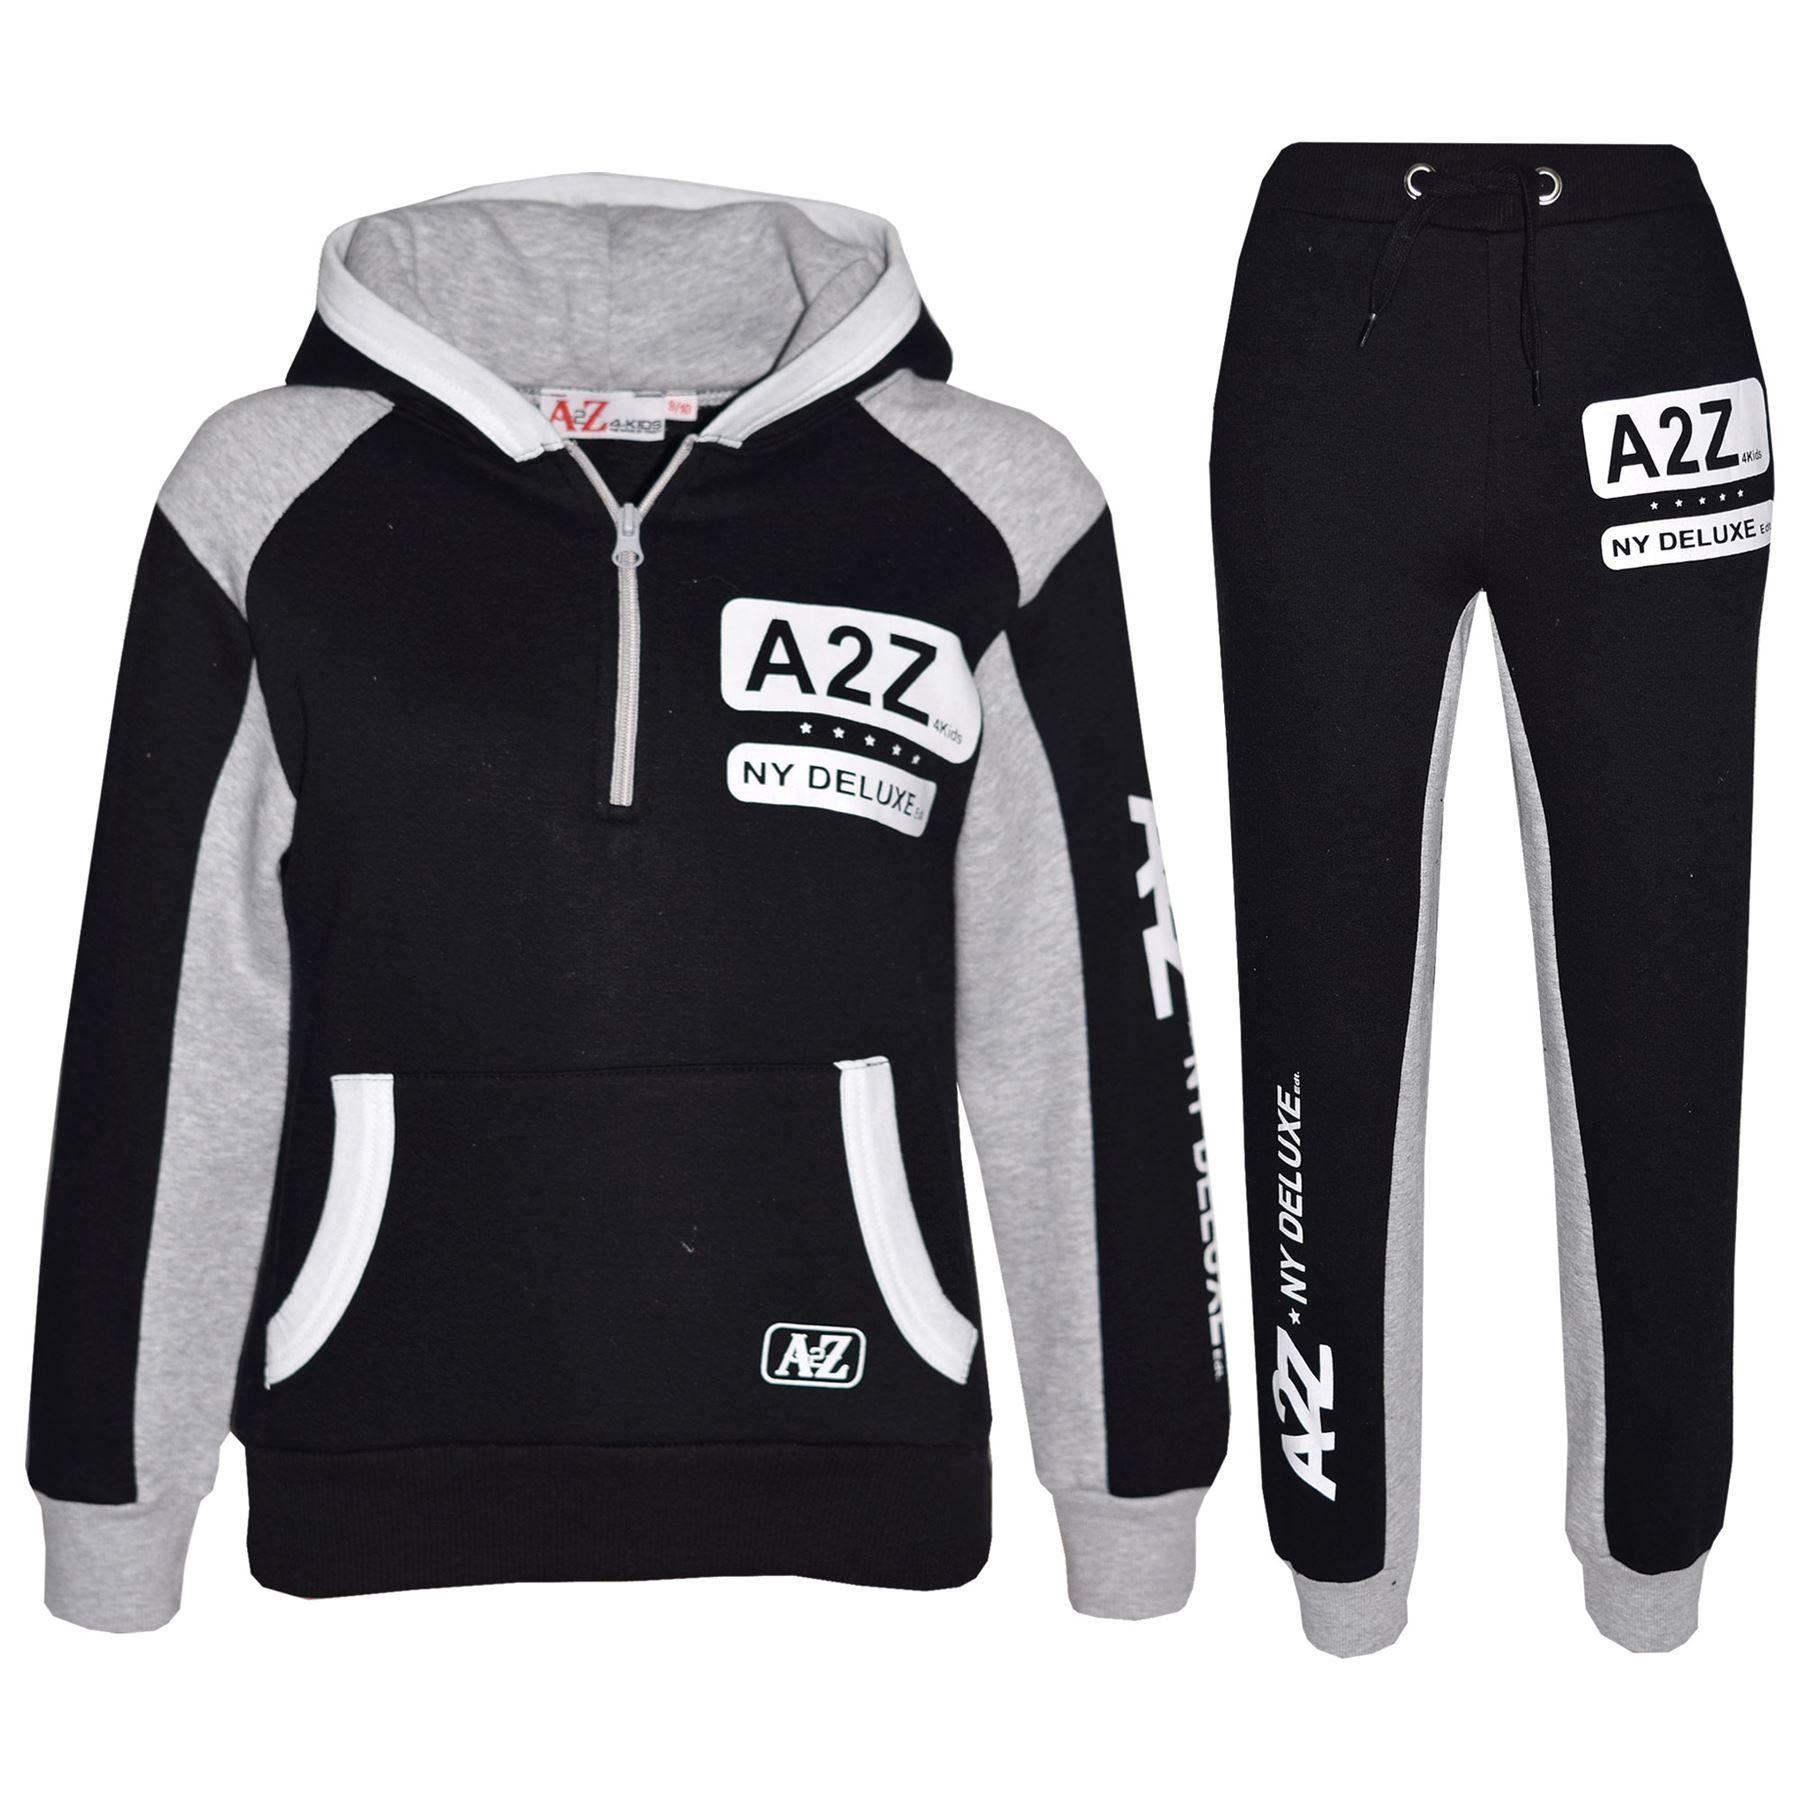 Kids Tracksuit Designer/'s Girls Boys Zipped Top /& Bottom Jogging Suit 7-13 Years